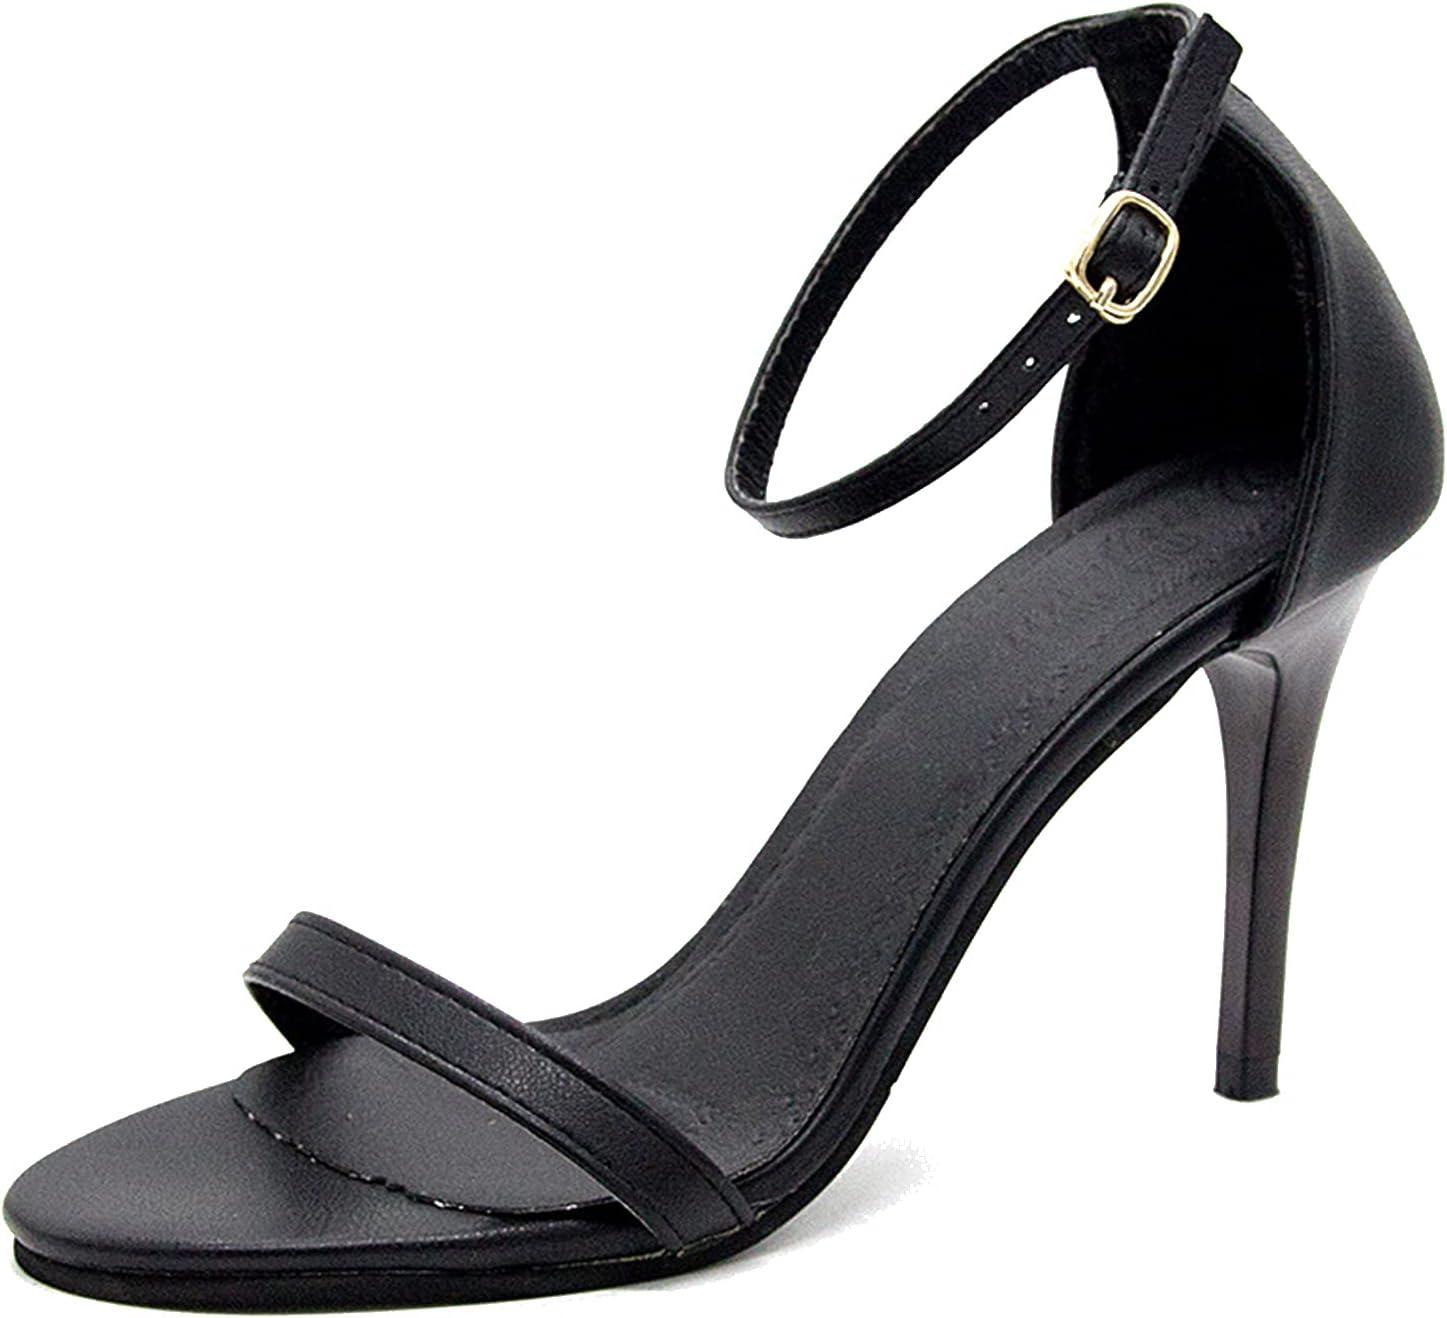 DGJL 9cm Heels Sandals Women's Stiletto Open Max 76% OFF Max 74% OFF Shoes Lad Toe Heel